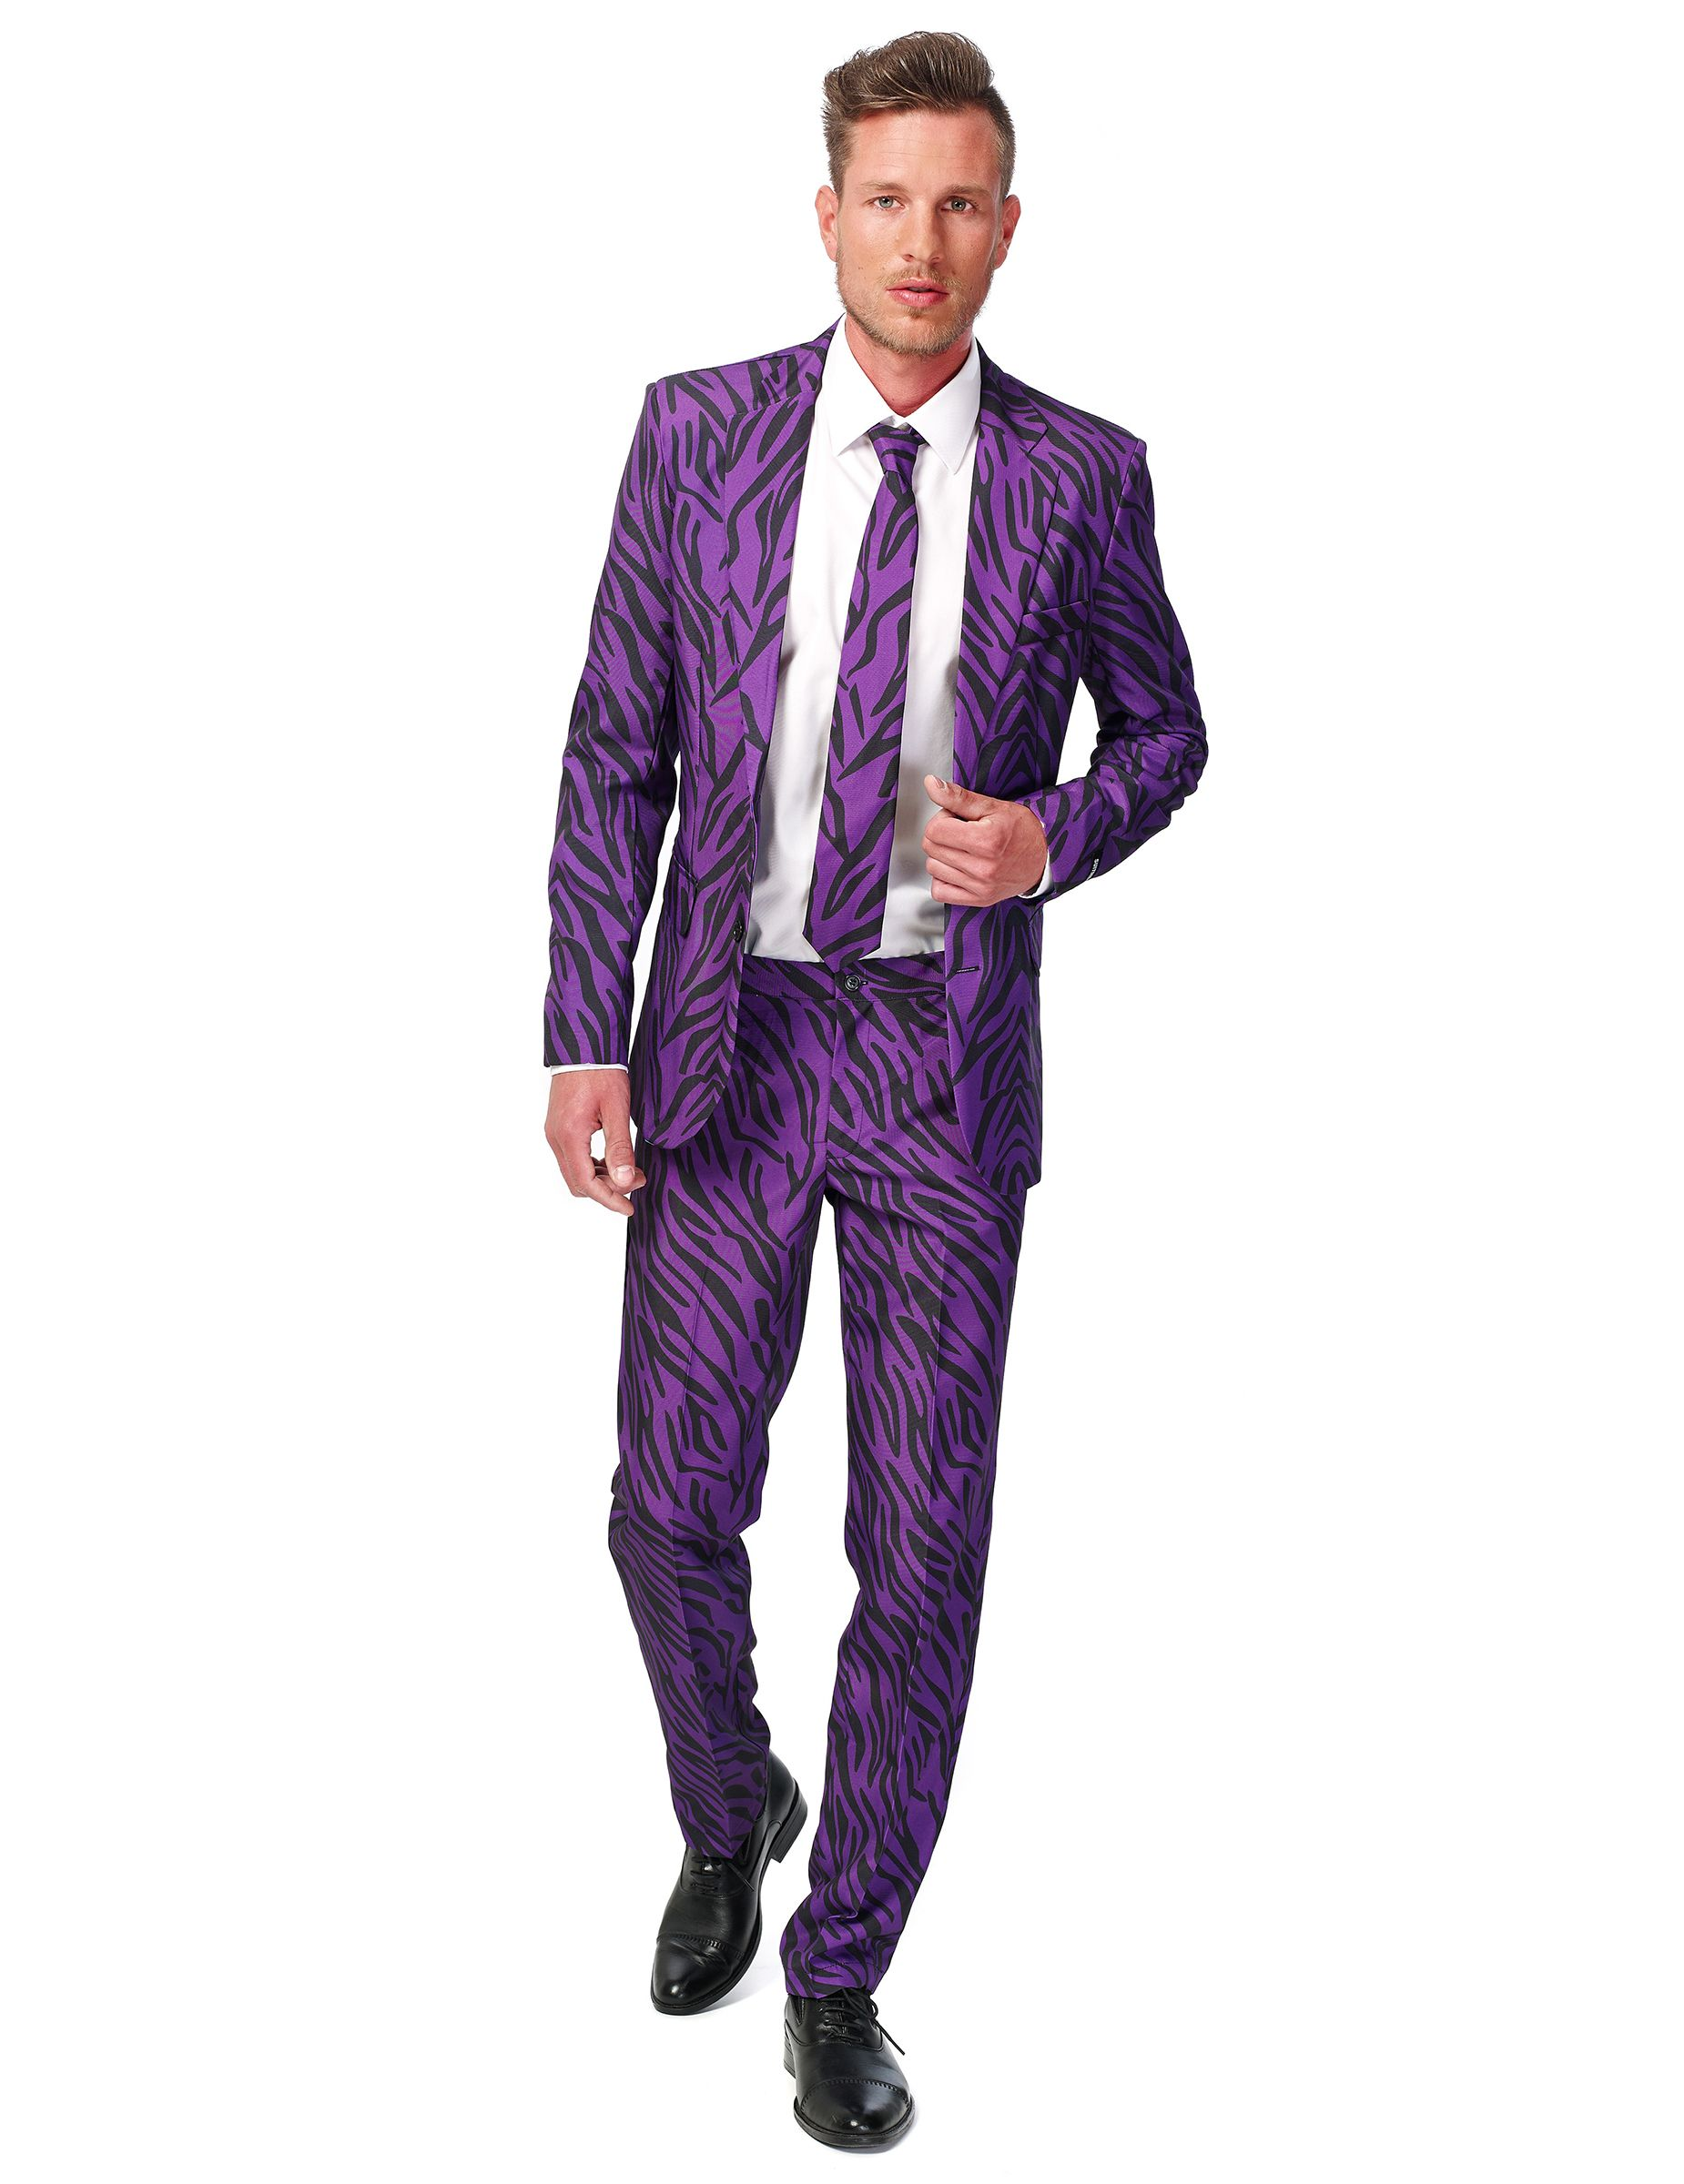 Traje tigre violeta hombre Suitmeister™ | Pinterest | Traje, Comprar ...